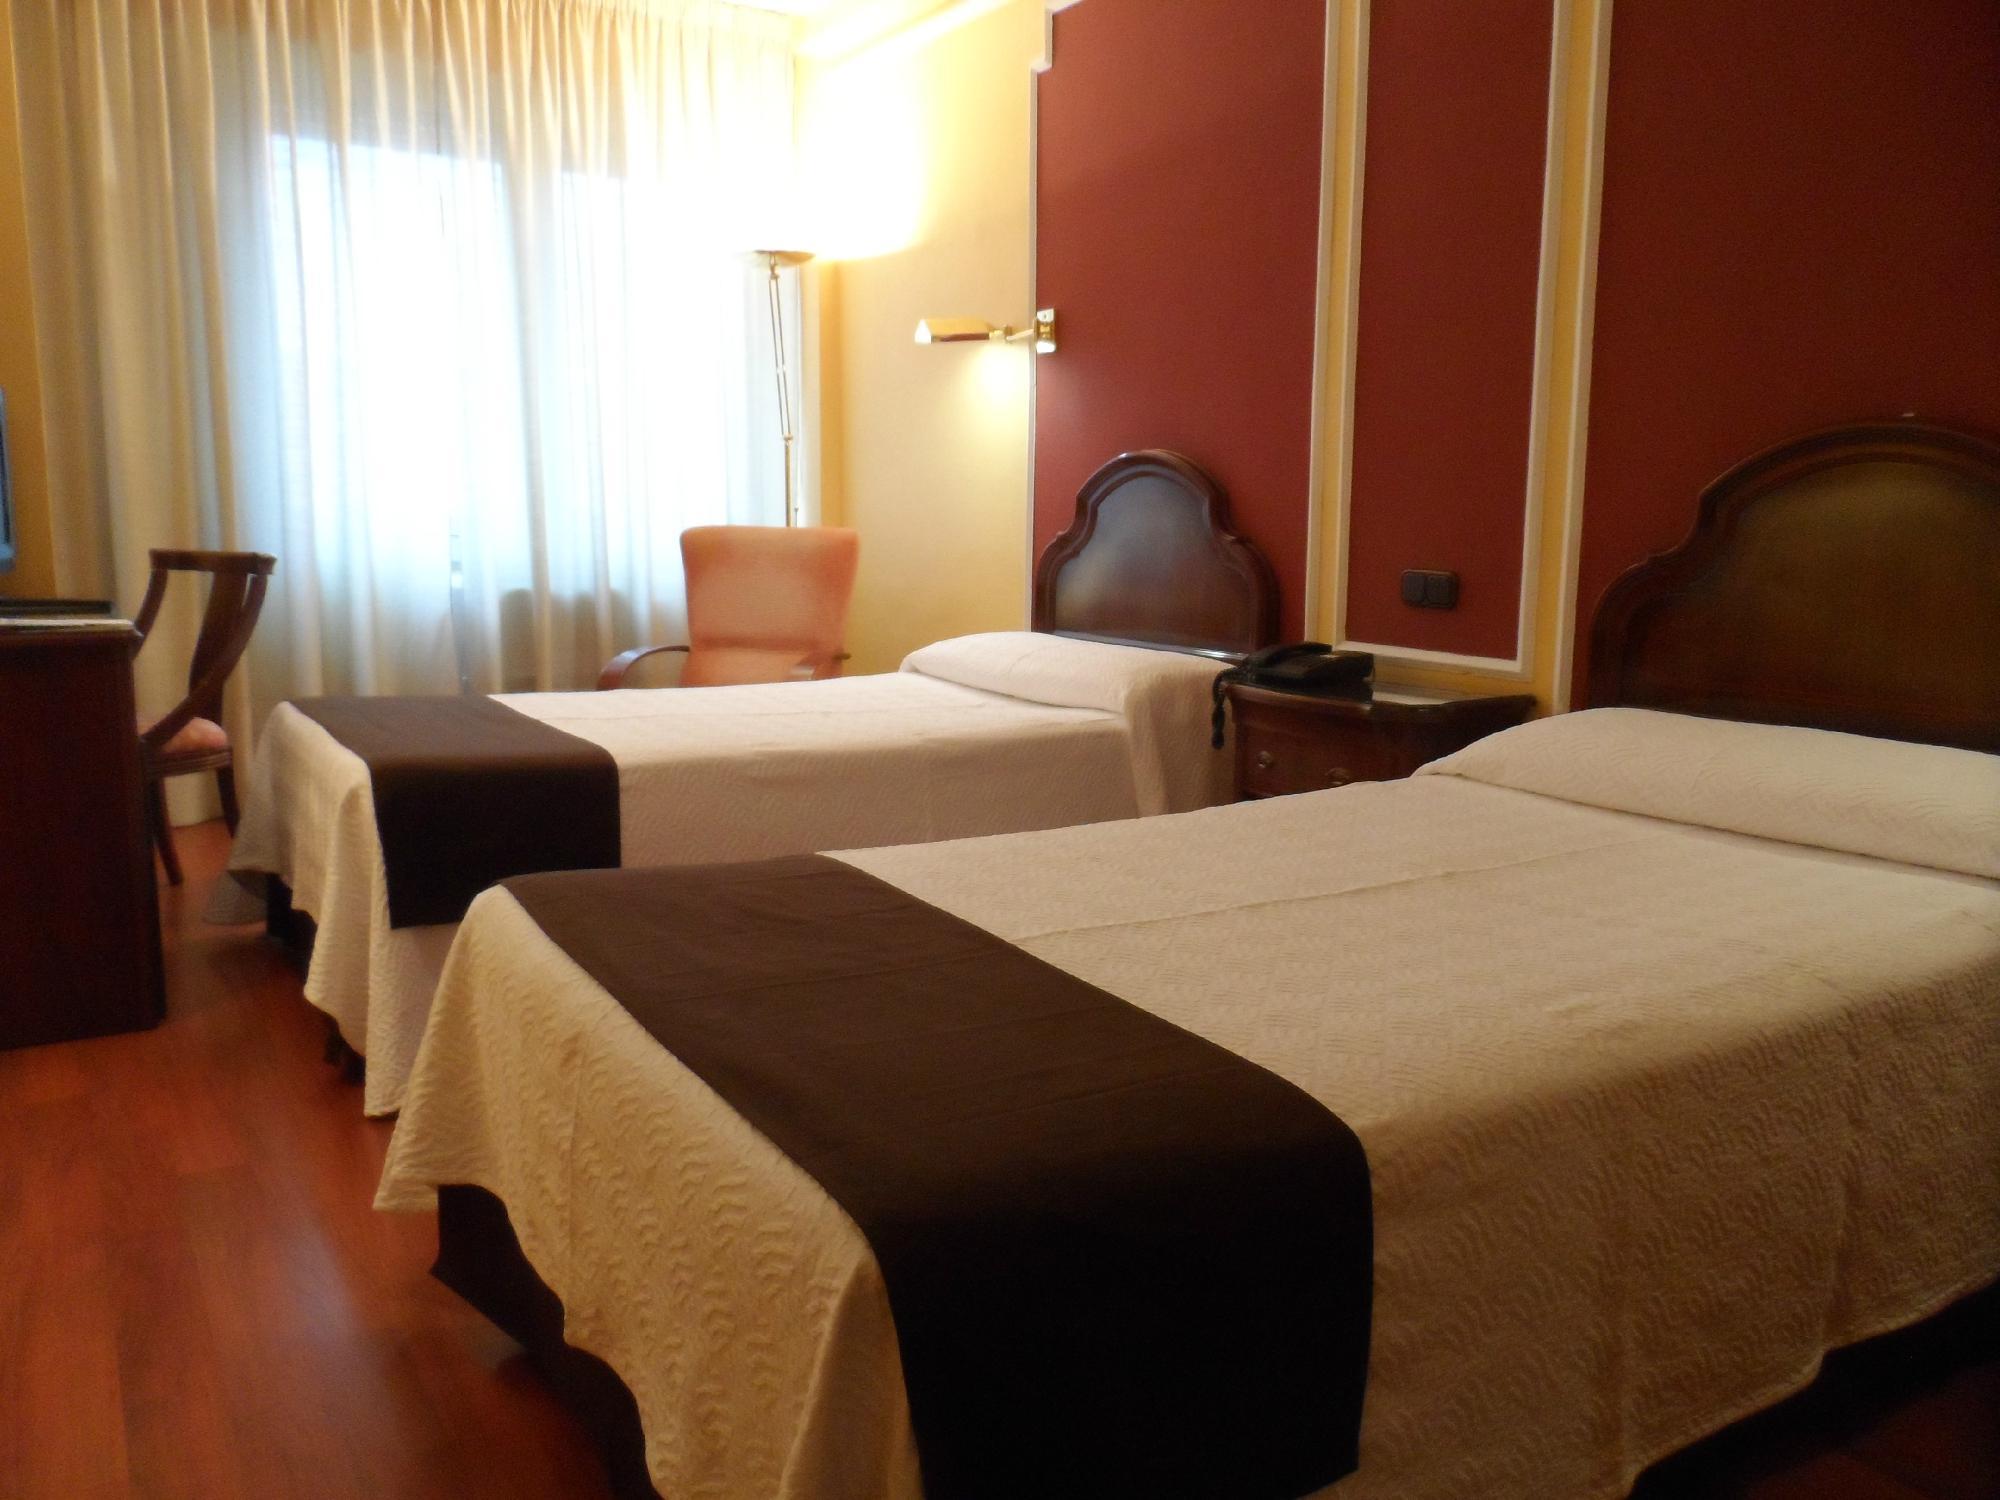 Hotel Corona de Castilla